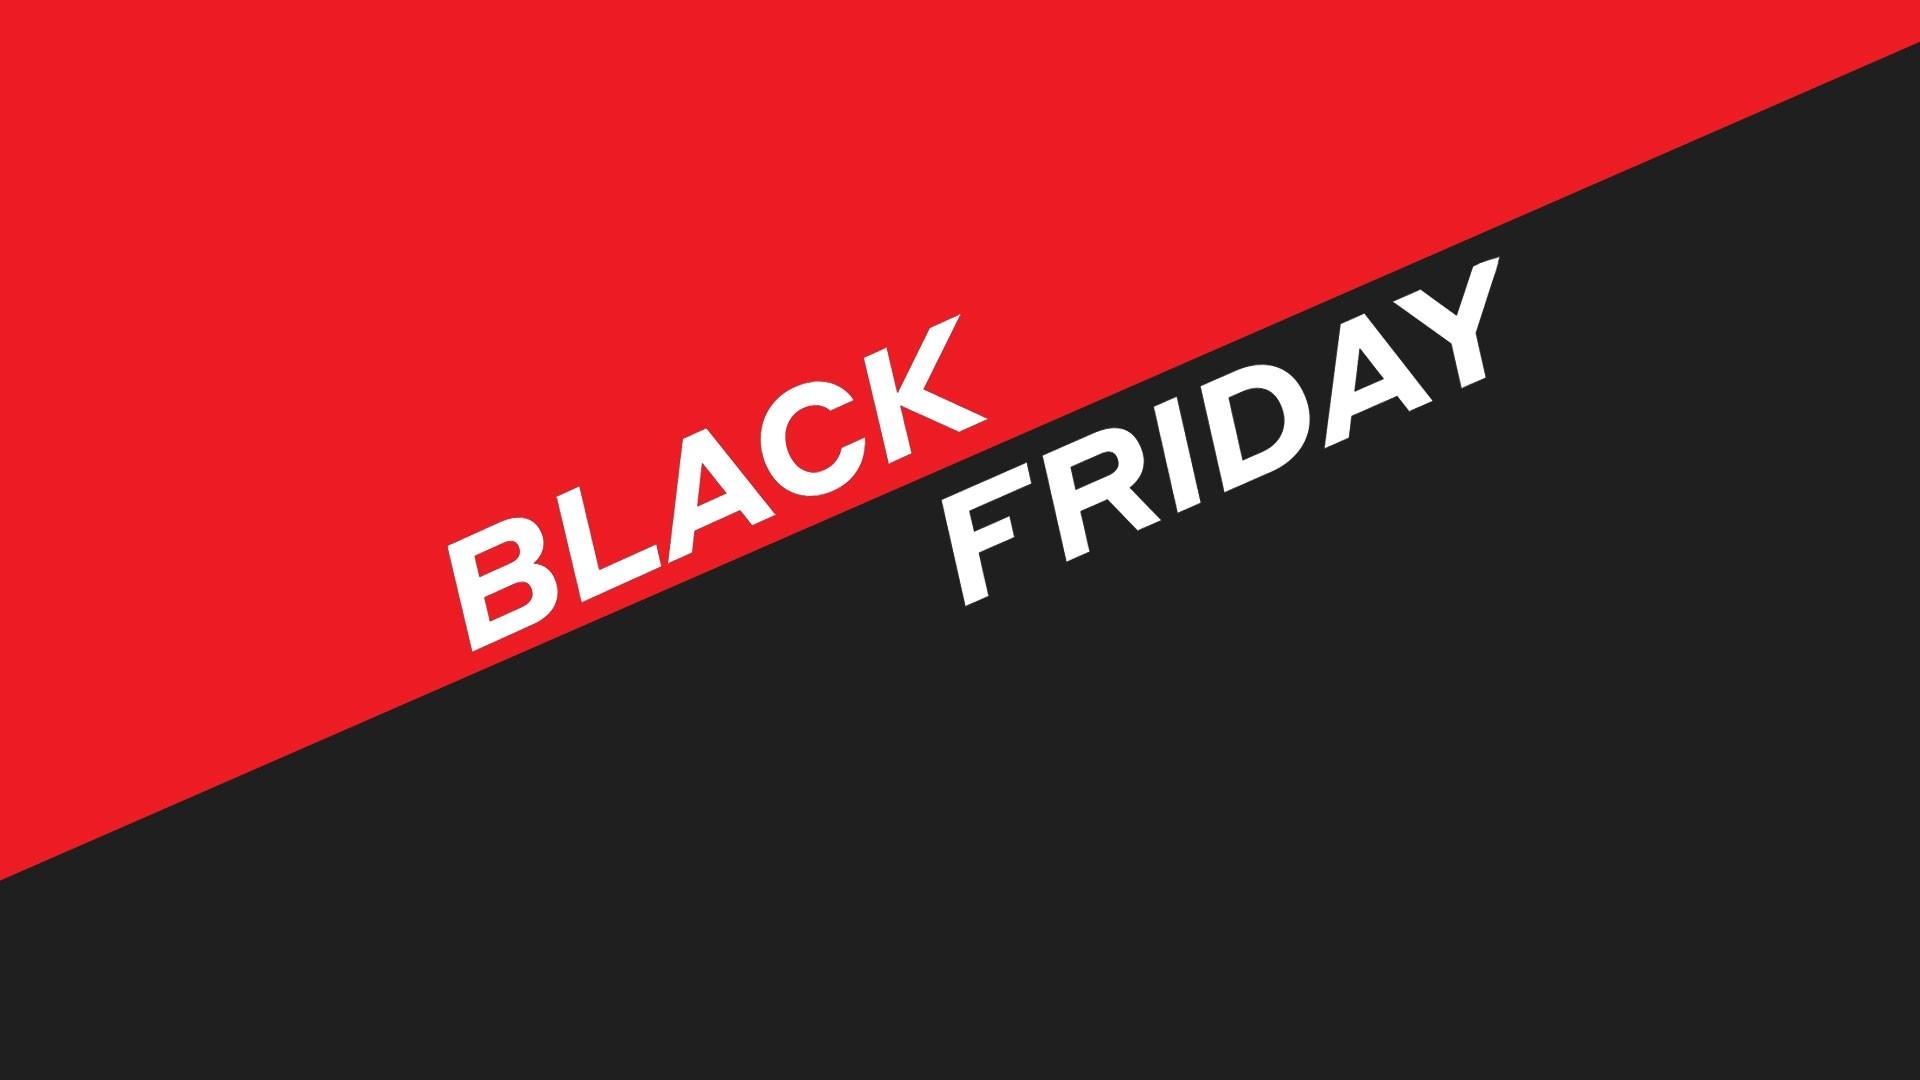 Black Friday Background Wallpaper